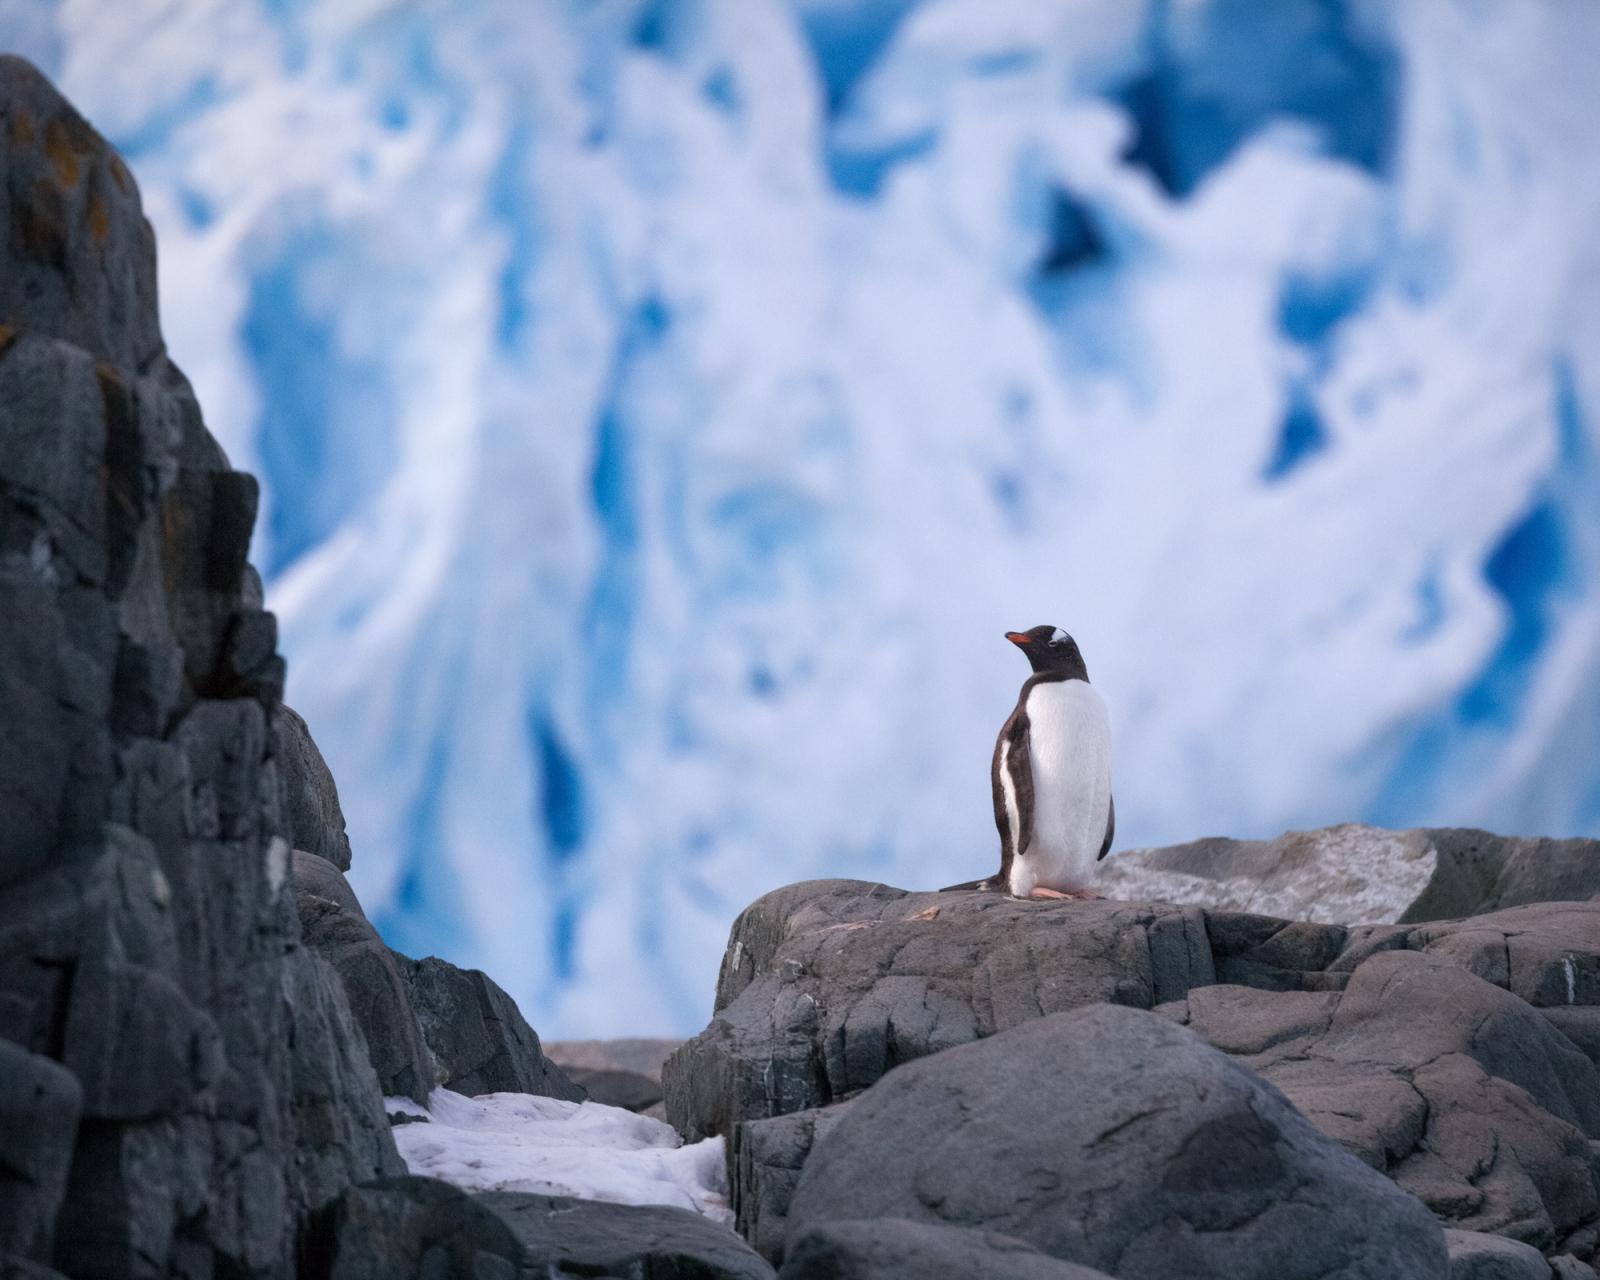 Art and Documentary Photography - Loading 0_Antarctica_UPLOAD_acaciajohnson_29.jpg